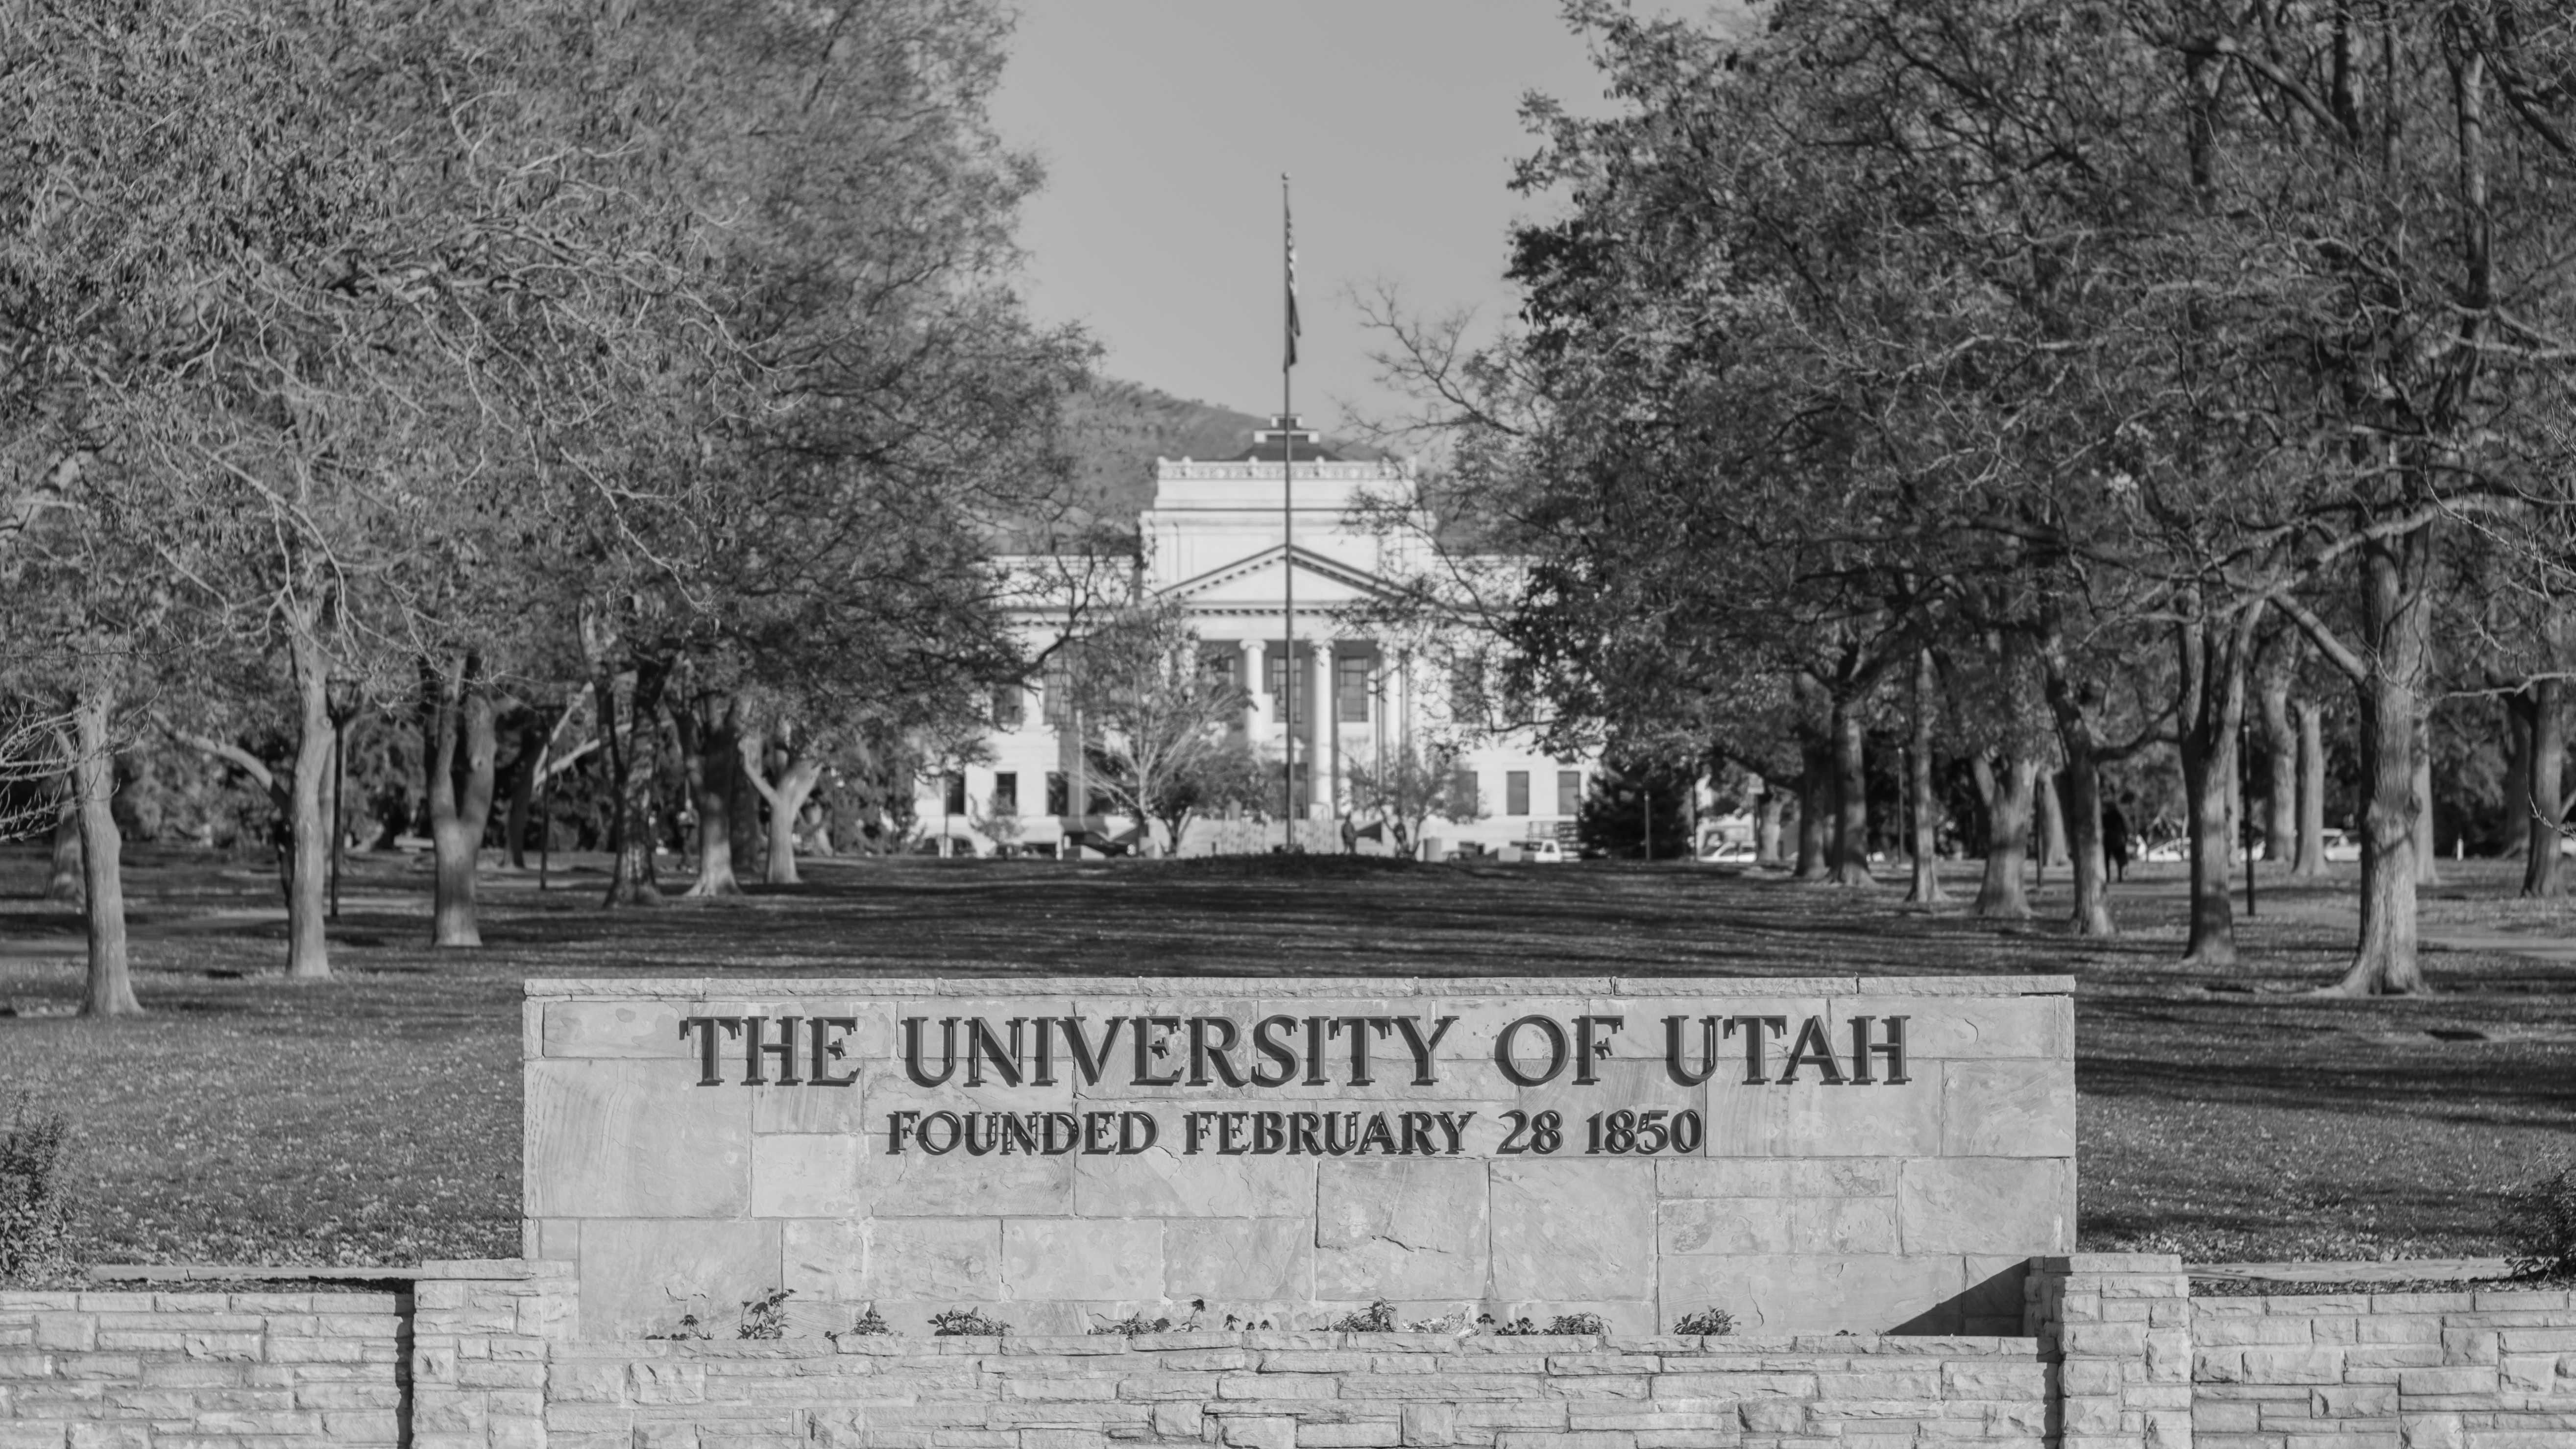 University of Utah's President's Circle in Salt Lake City, UT on Tuesday November 06, 2018.  (Photo by Curtis Lin | Daily Utah Chronicle)